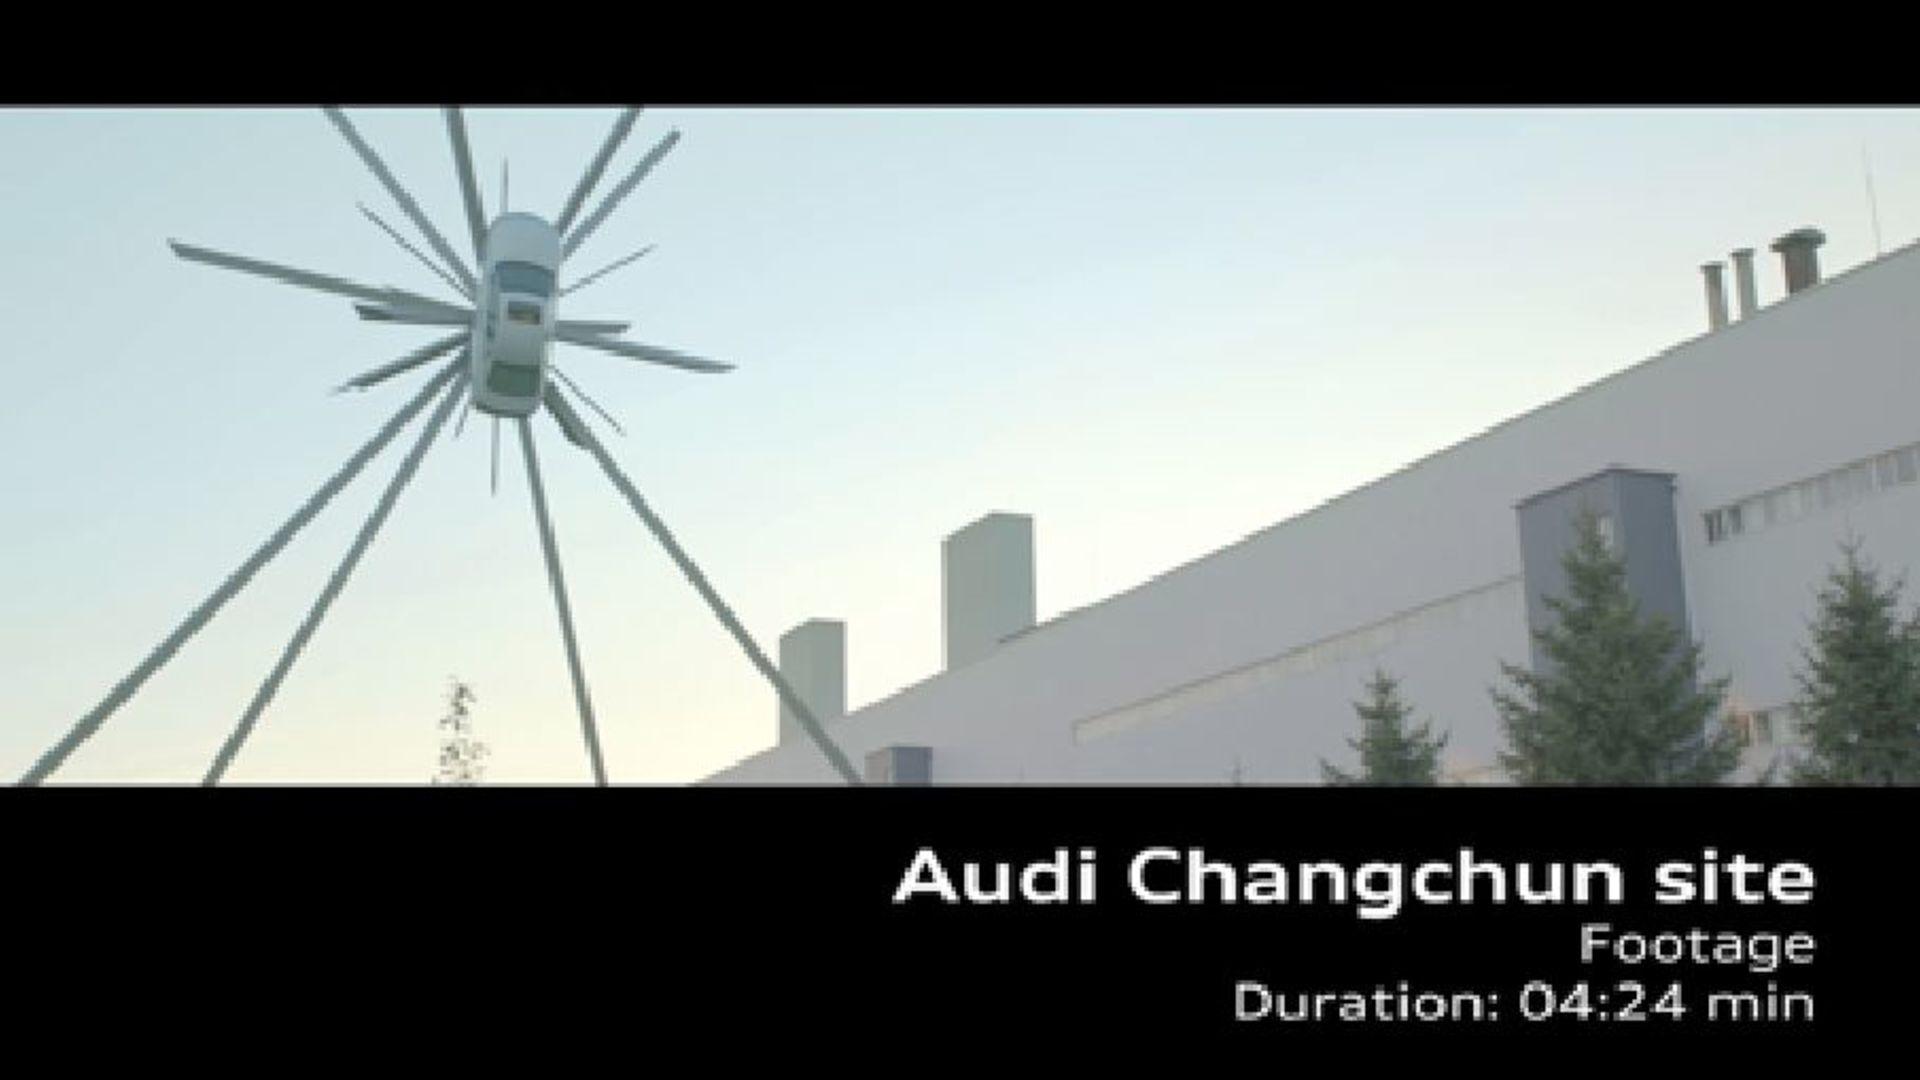 AUDI AG site in China - Changchun